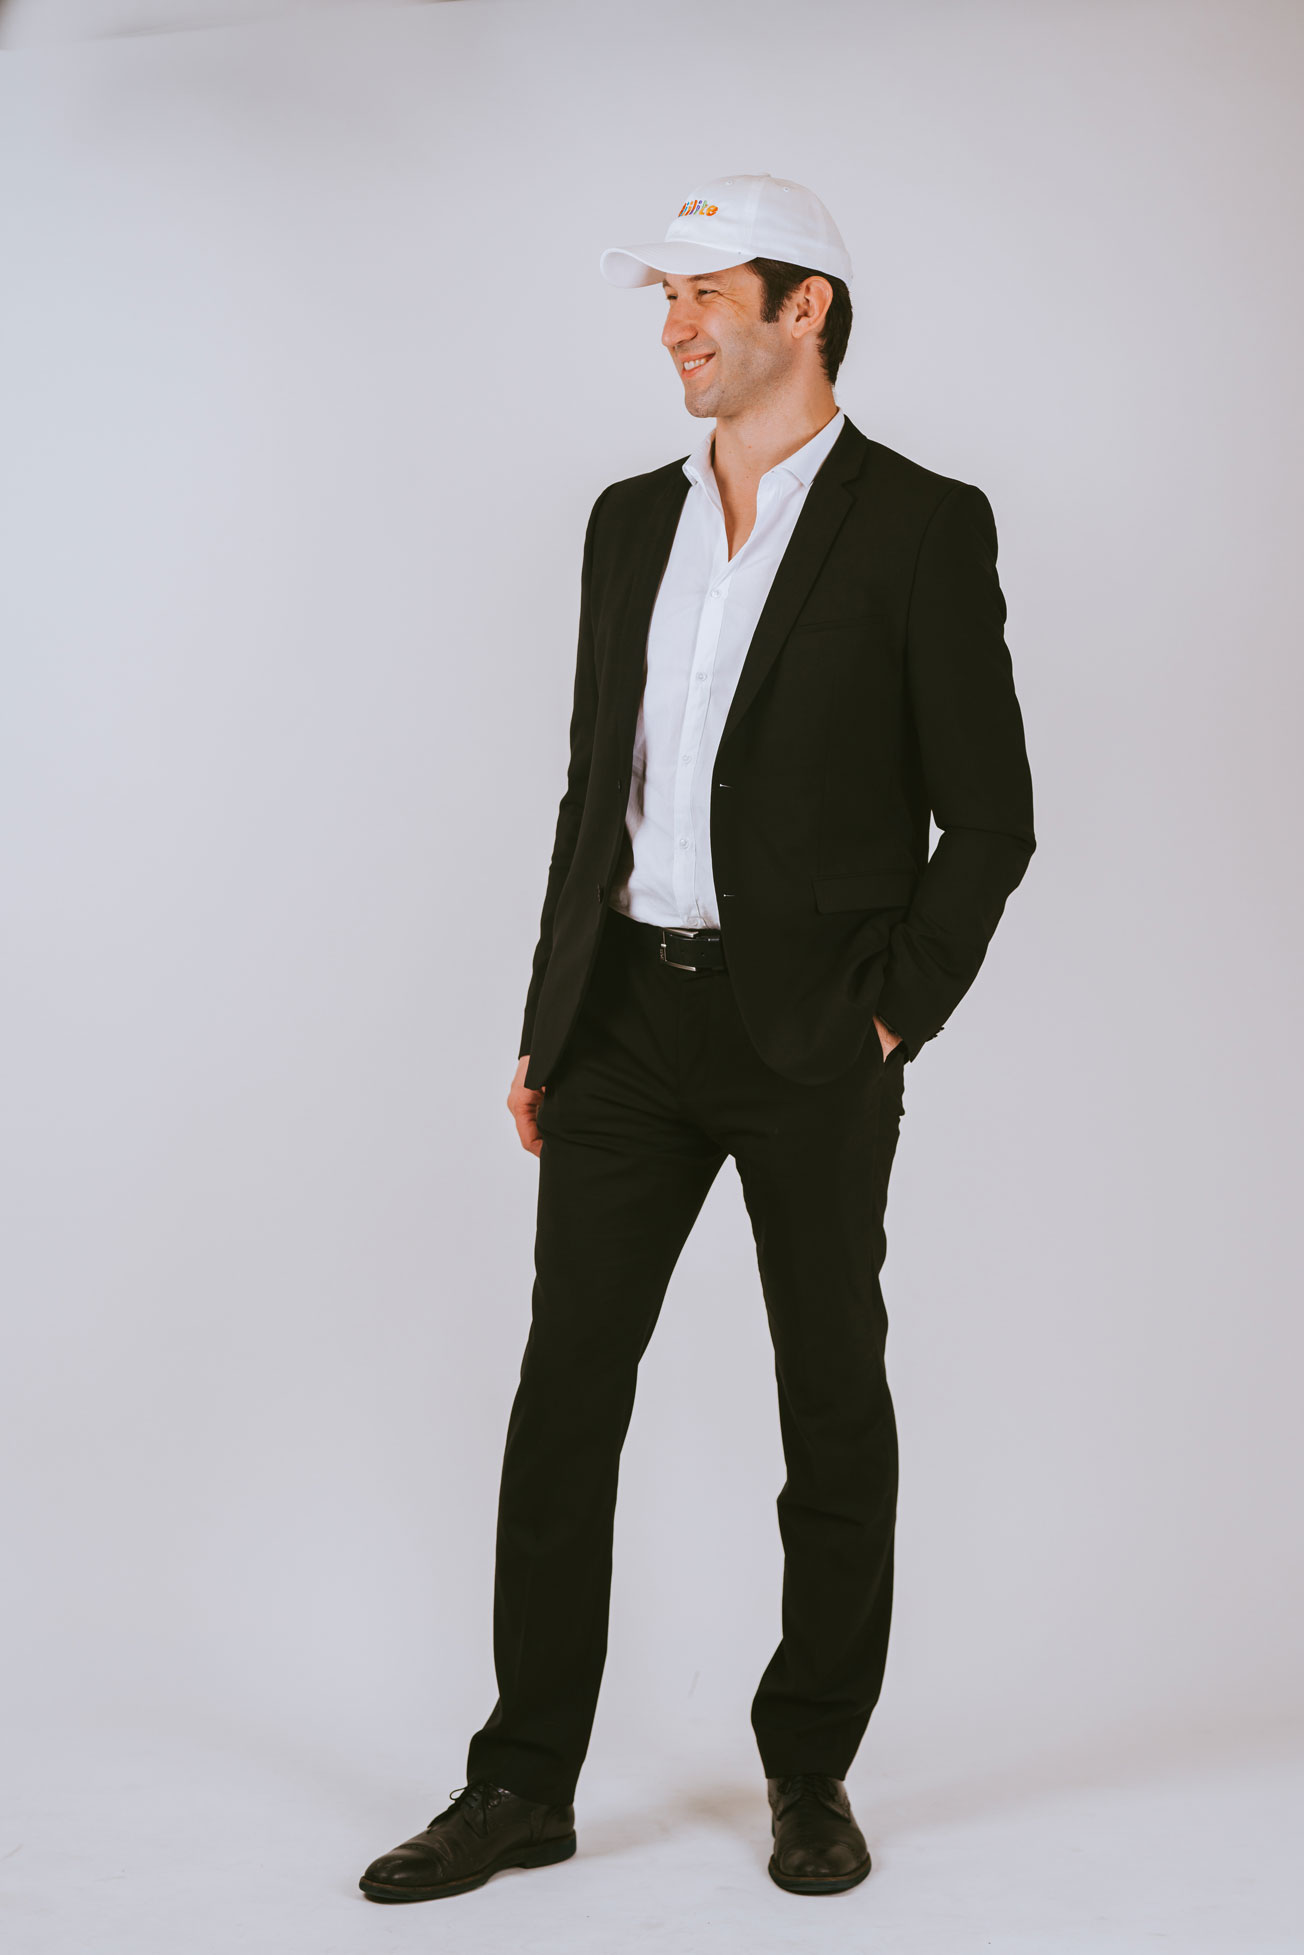 William-Walczak-CEO-UBC-SEO-Hiilite